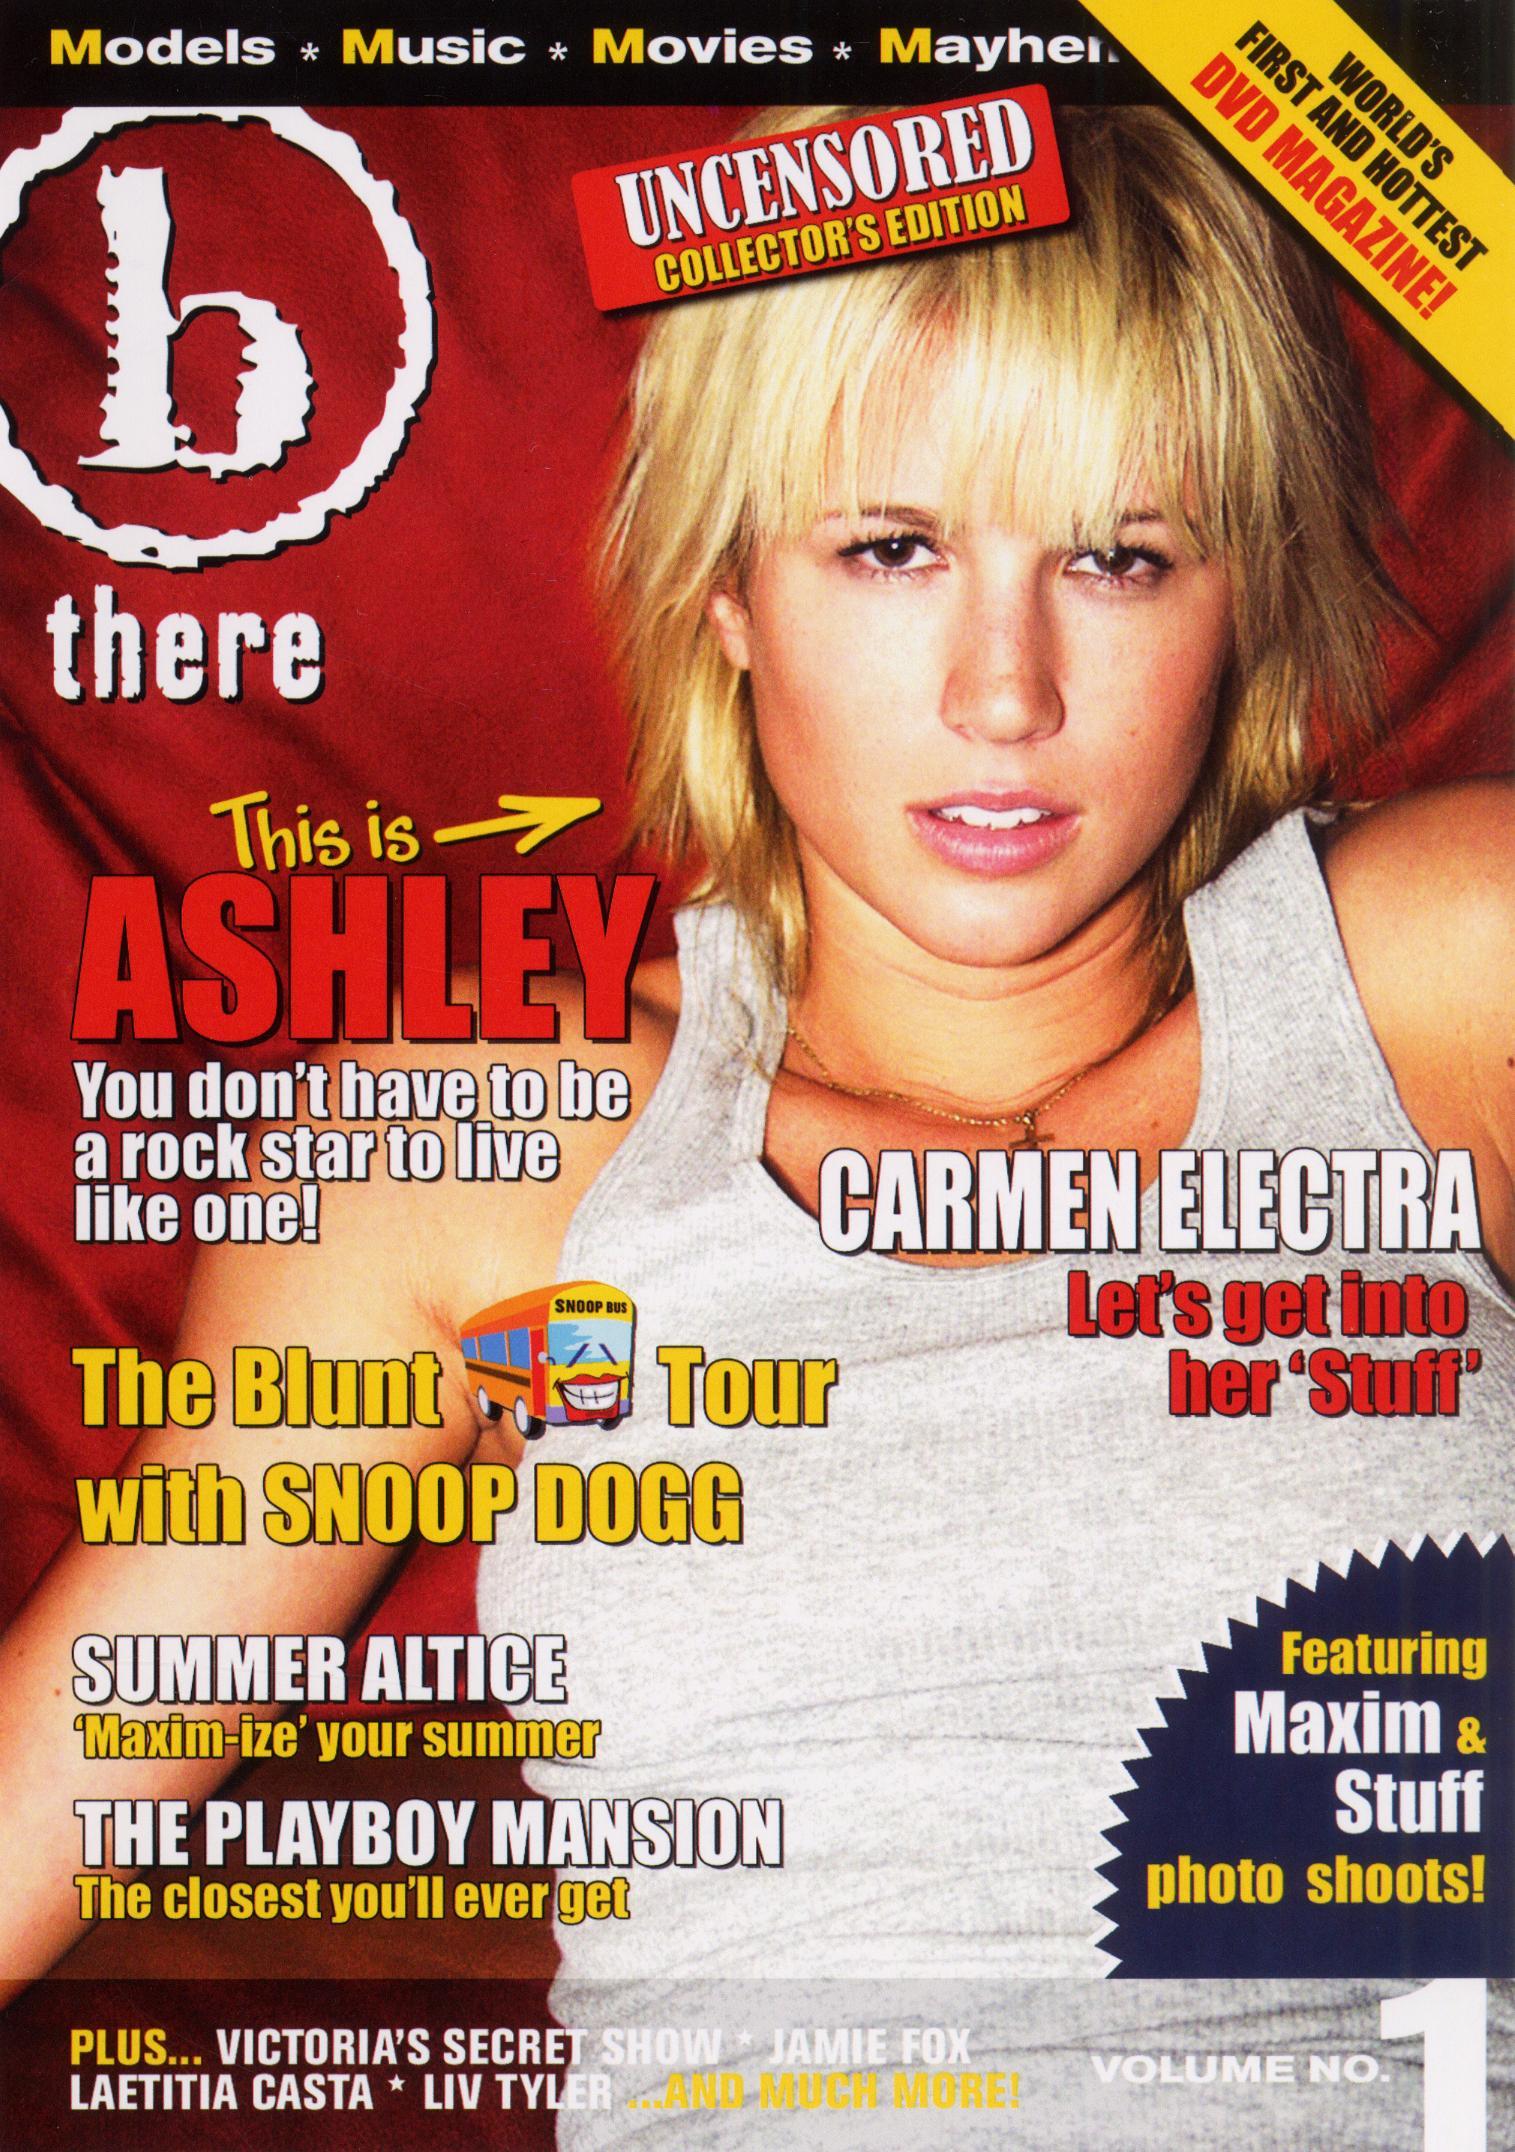 b There: The DVD Magazine, Vol. 1